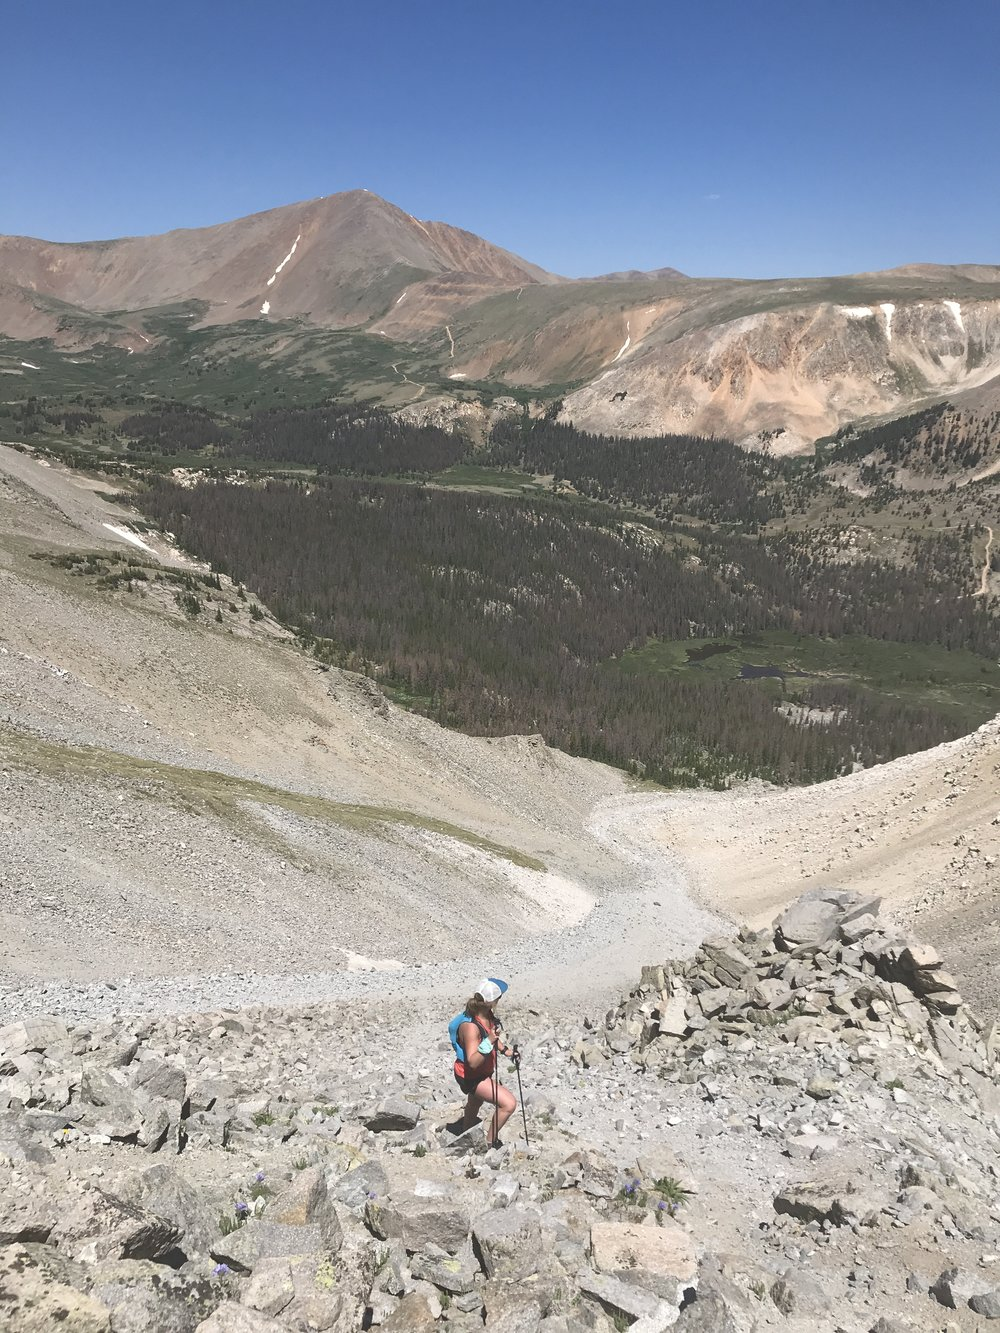 Typical terrain on Nolan's 14